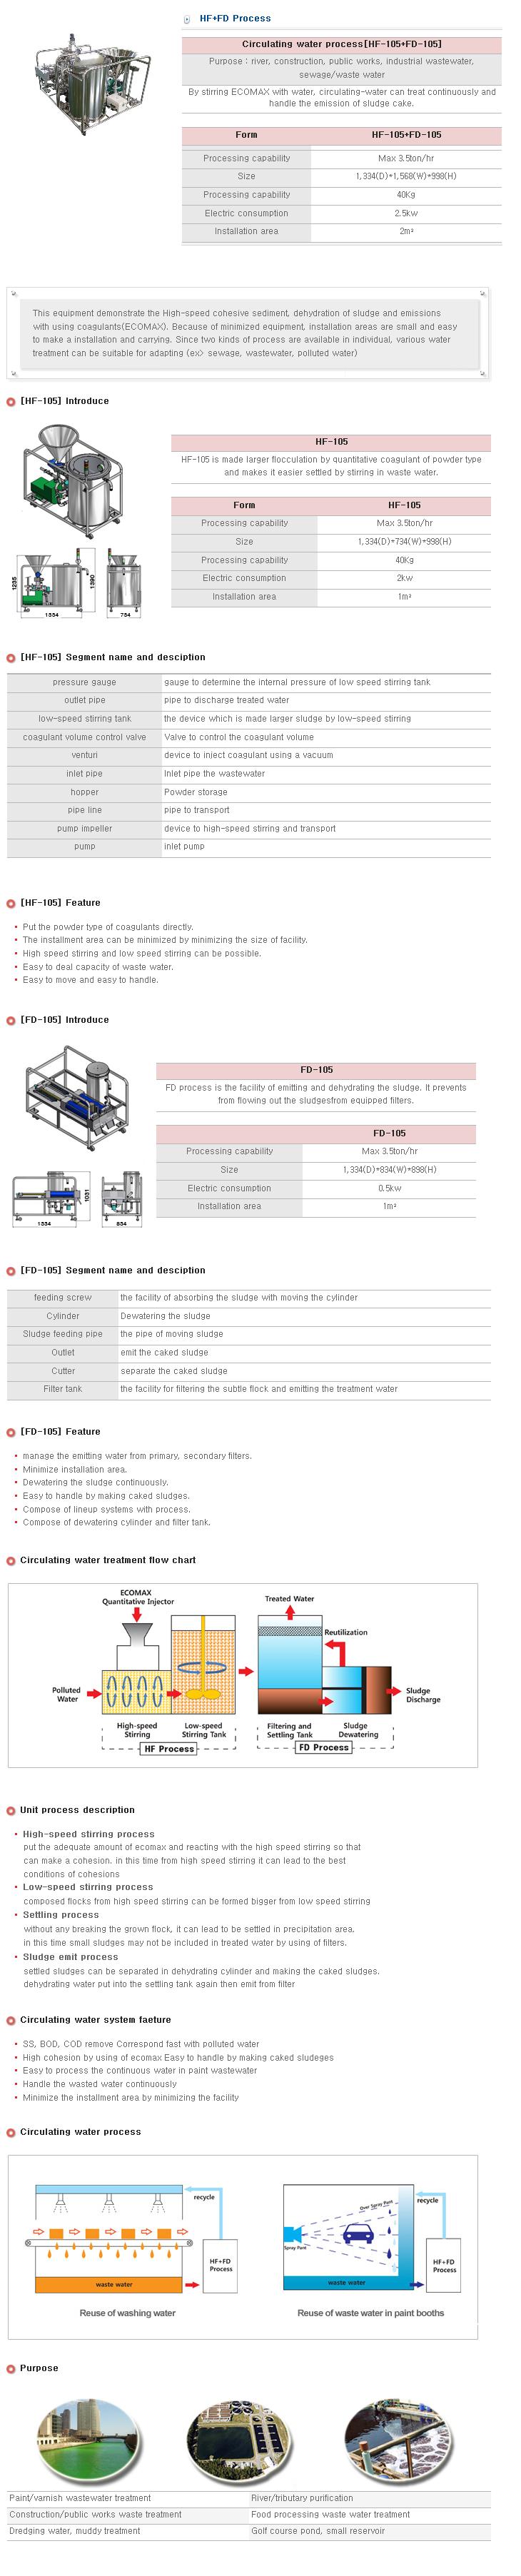 S&T Korea HF+FD Process HF/FD-105